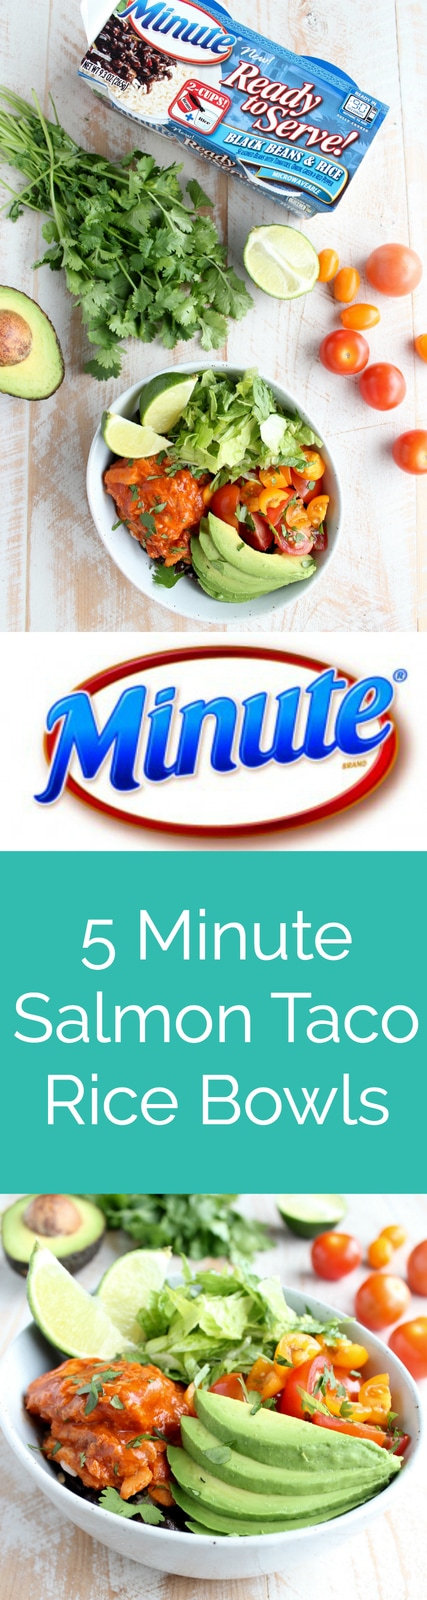 5 Minute Salmon Taco Rice Bowls